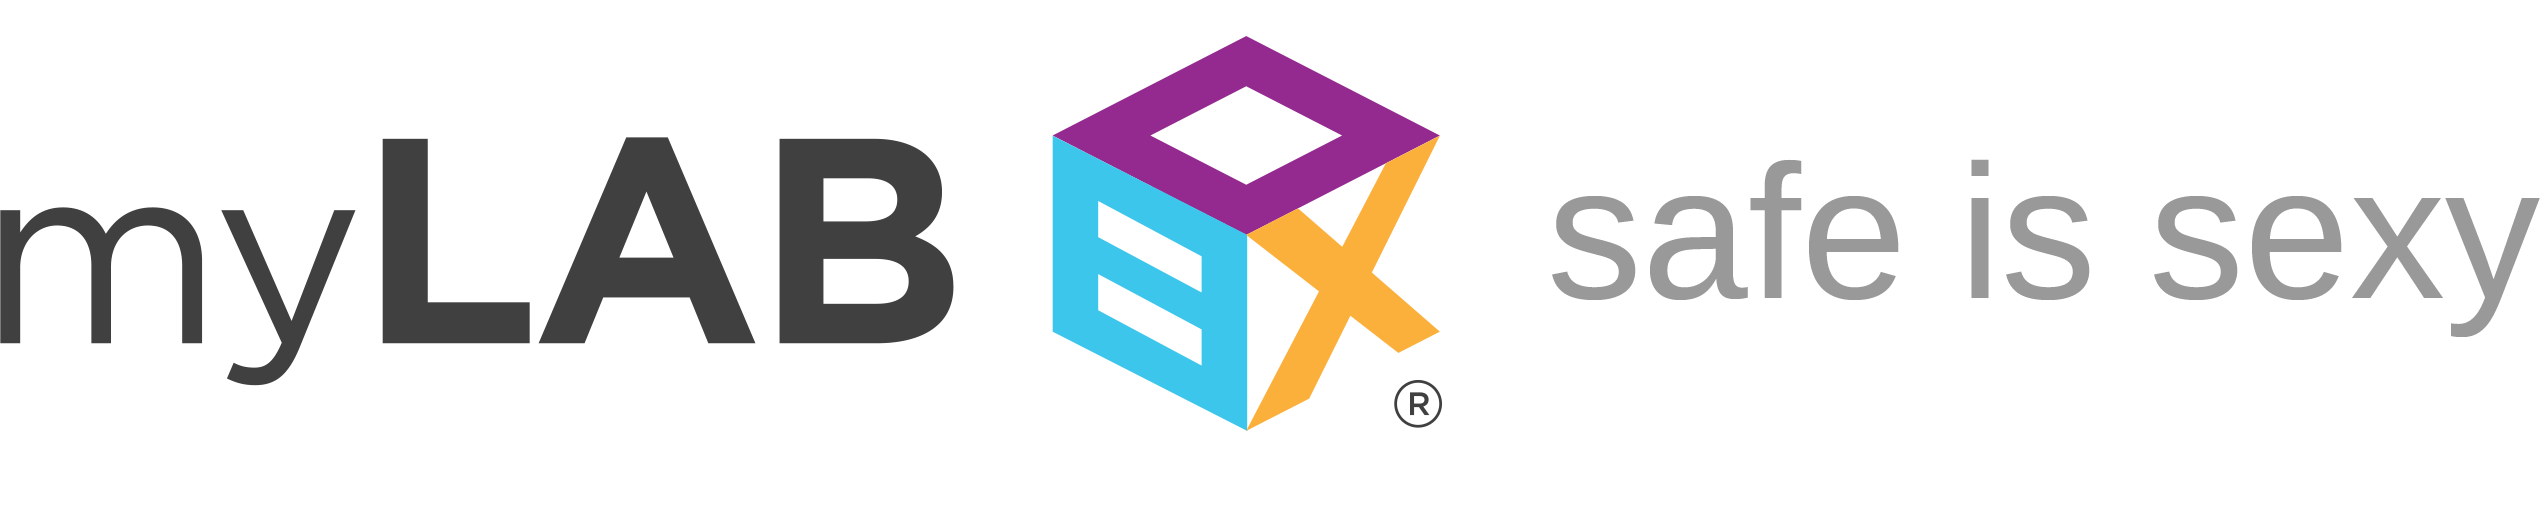 Mylabbox